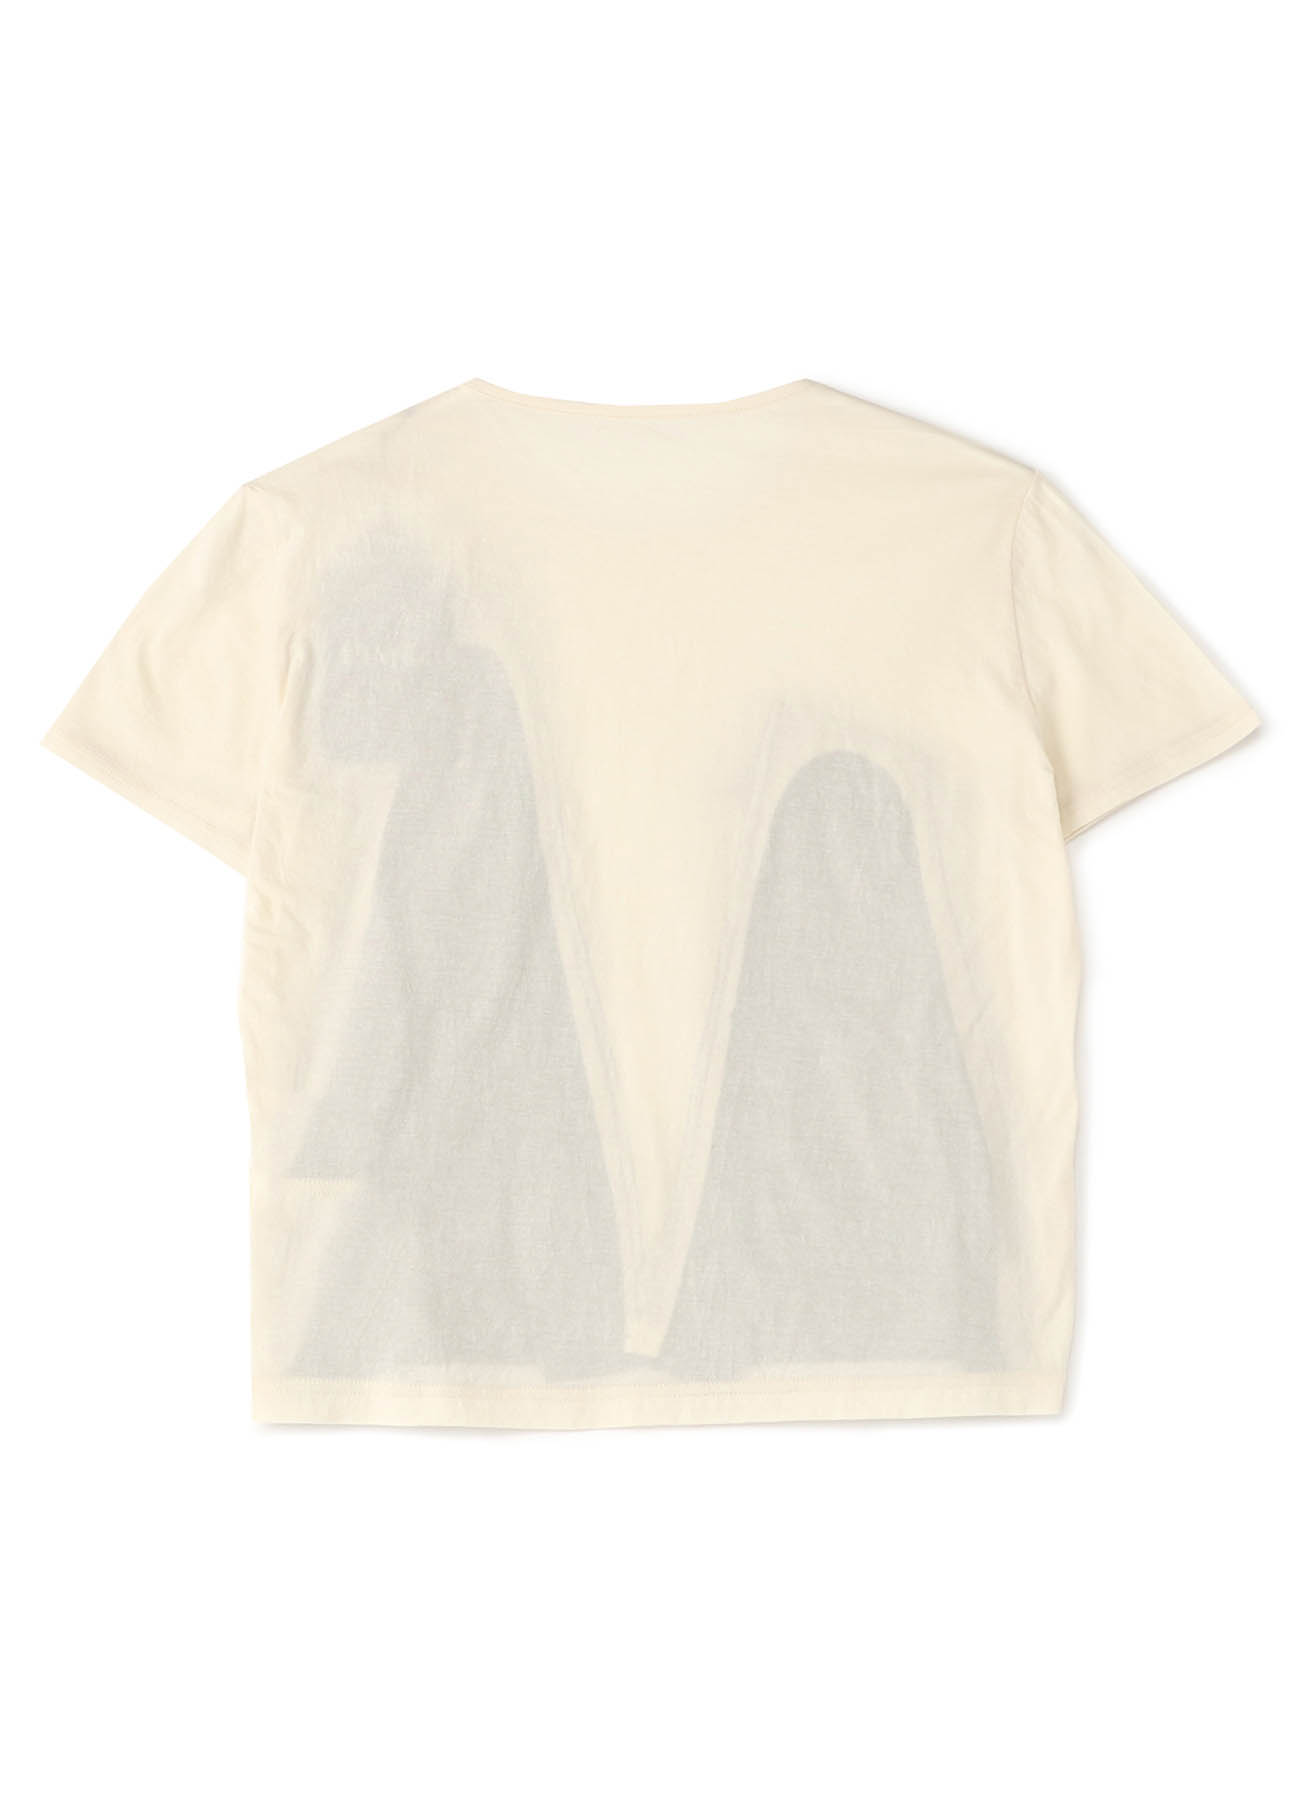 Cotton Crepe Plain Stitch Mix Layered Design T